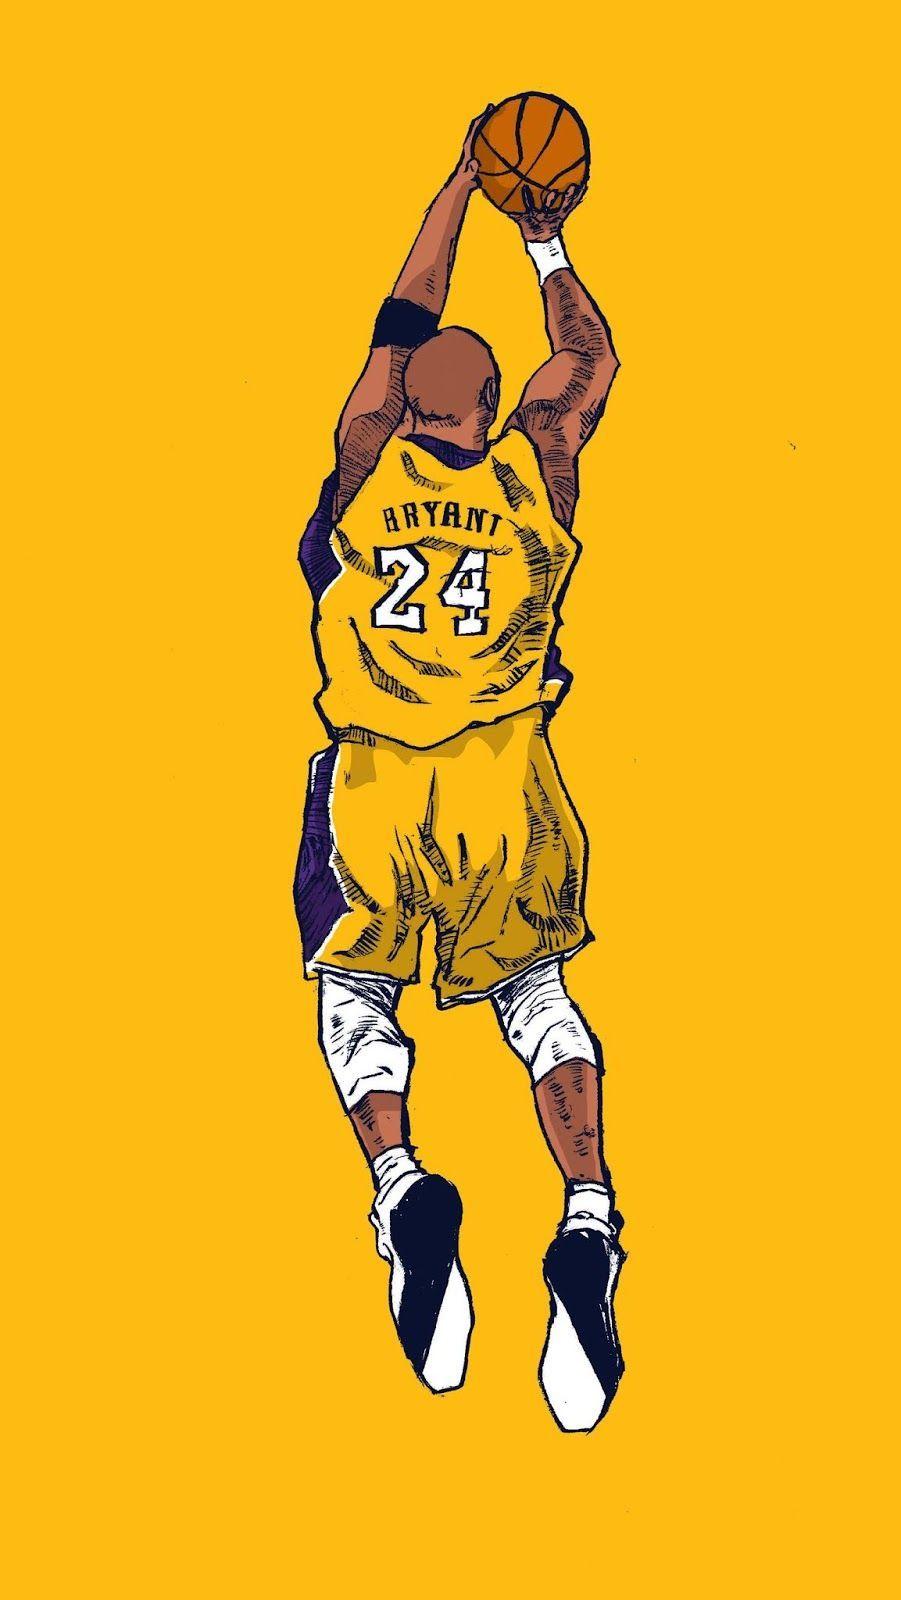 Sfondi Di Kobe Bryant Per Telefono Heroscreen Wallpapers In 2020 Kobe Bryant Wallpaper Kobe Bryant Tattoos Kobe Bryant Iphone Wallpaper